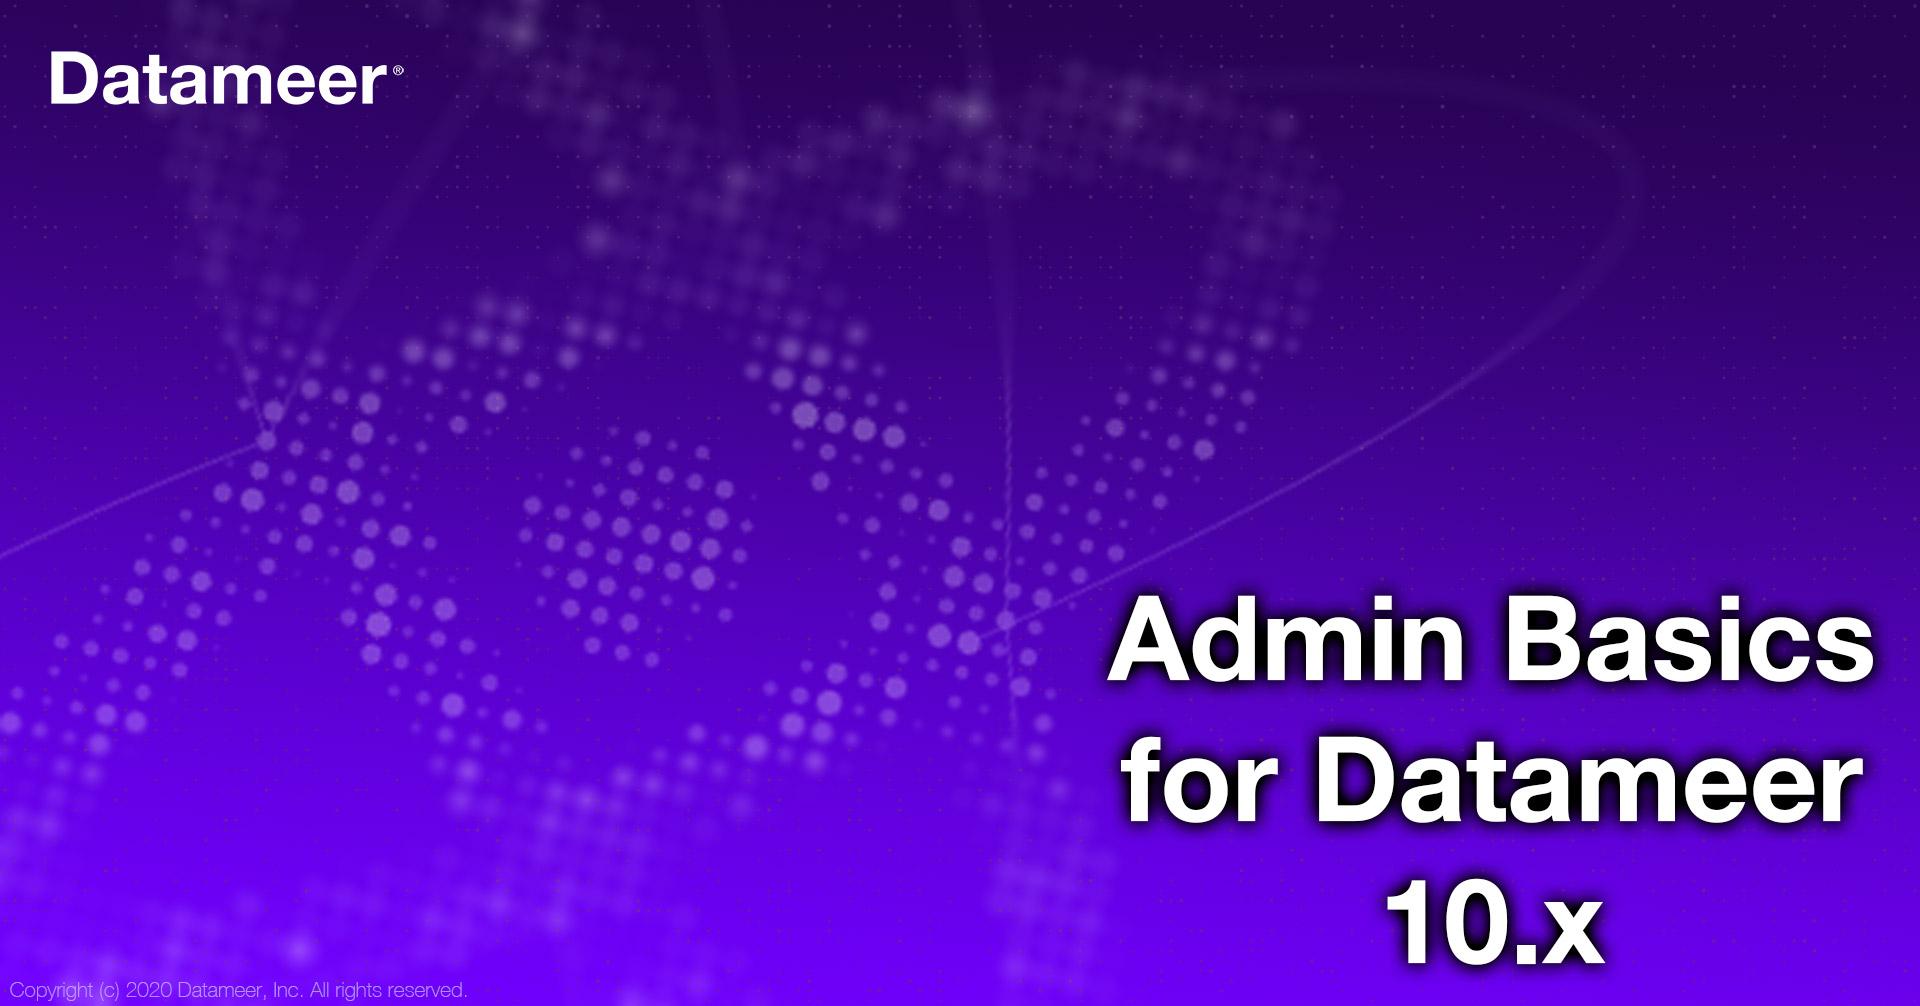 Administration Basics for Datameer 10.x